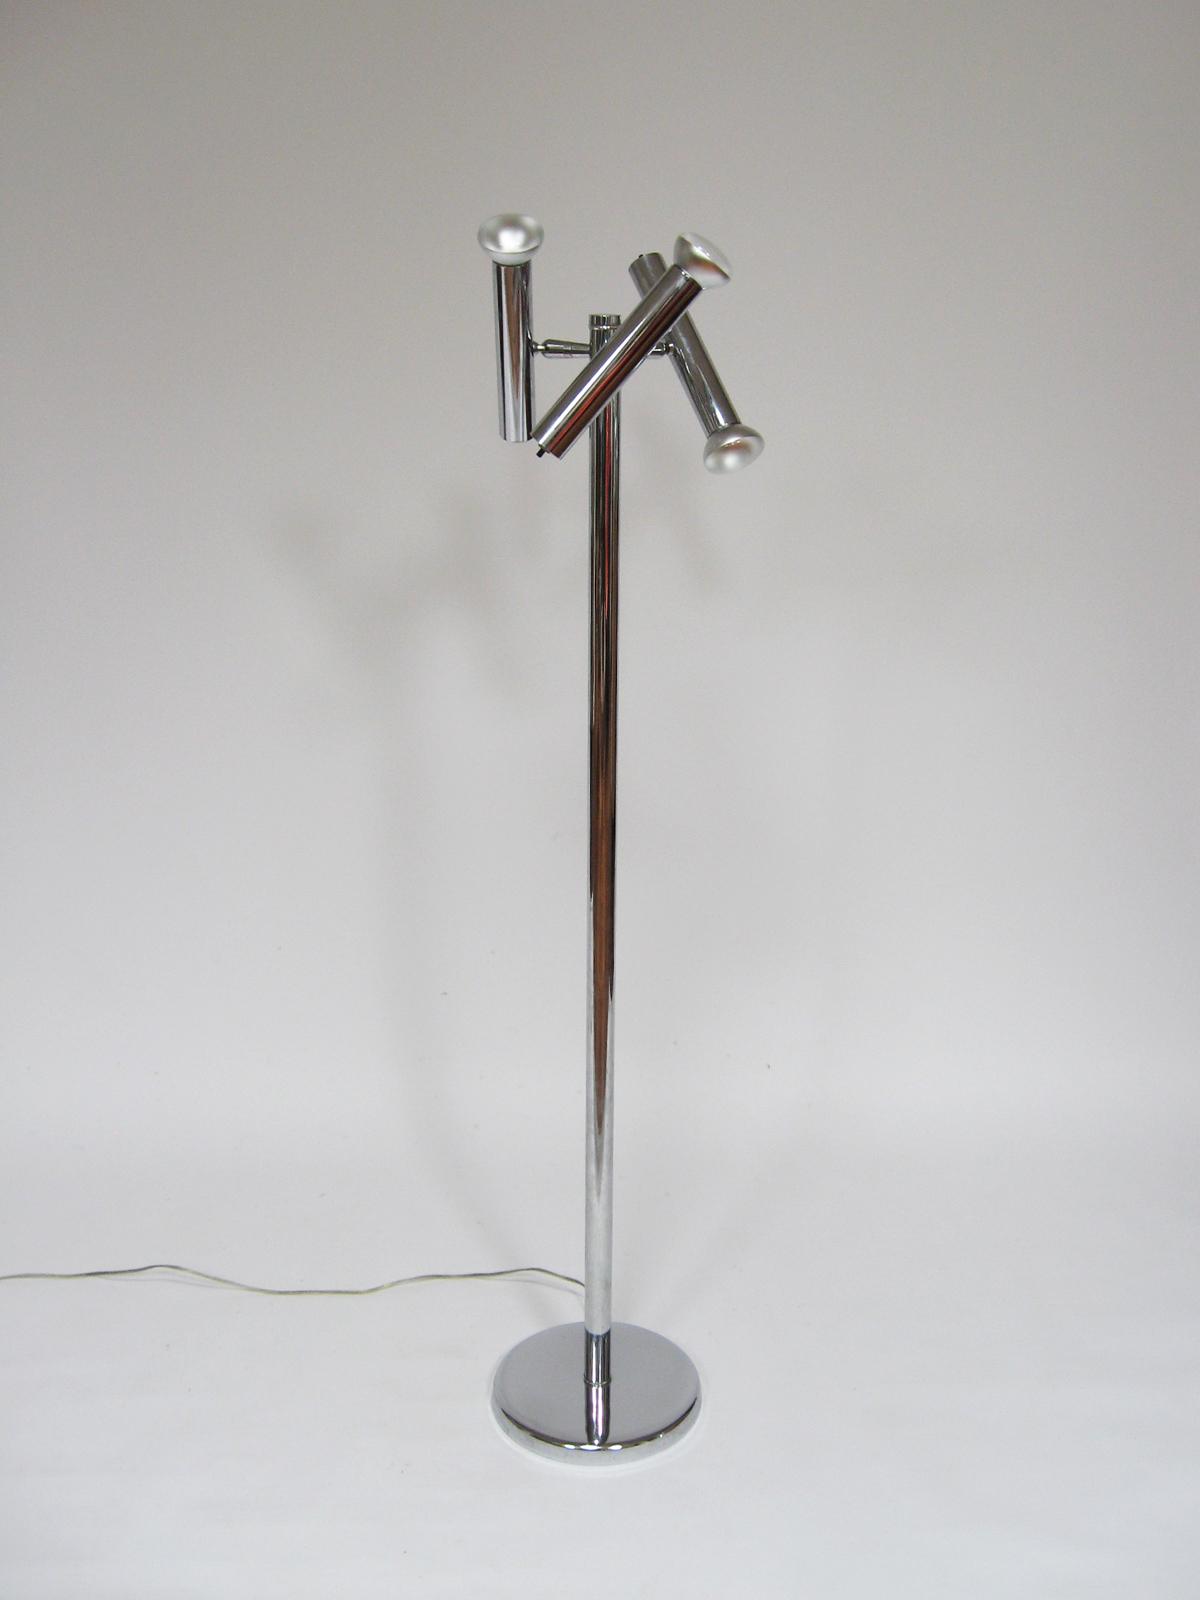 Minimalist Floor Lamp by TSAO